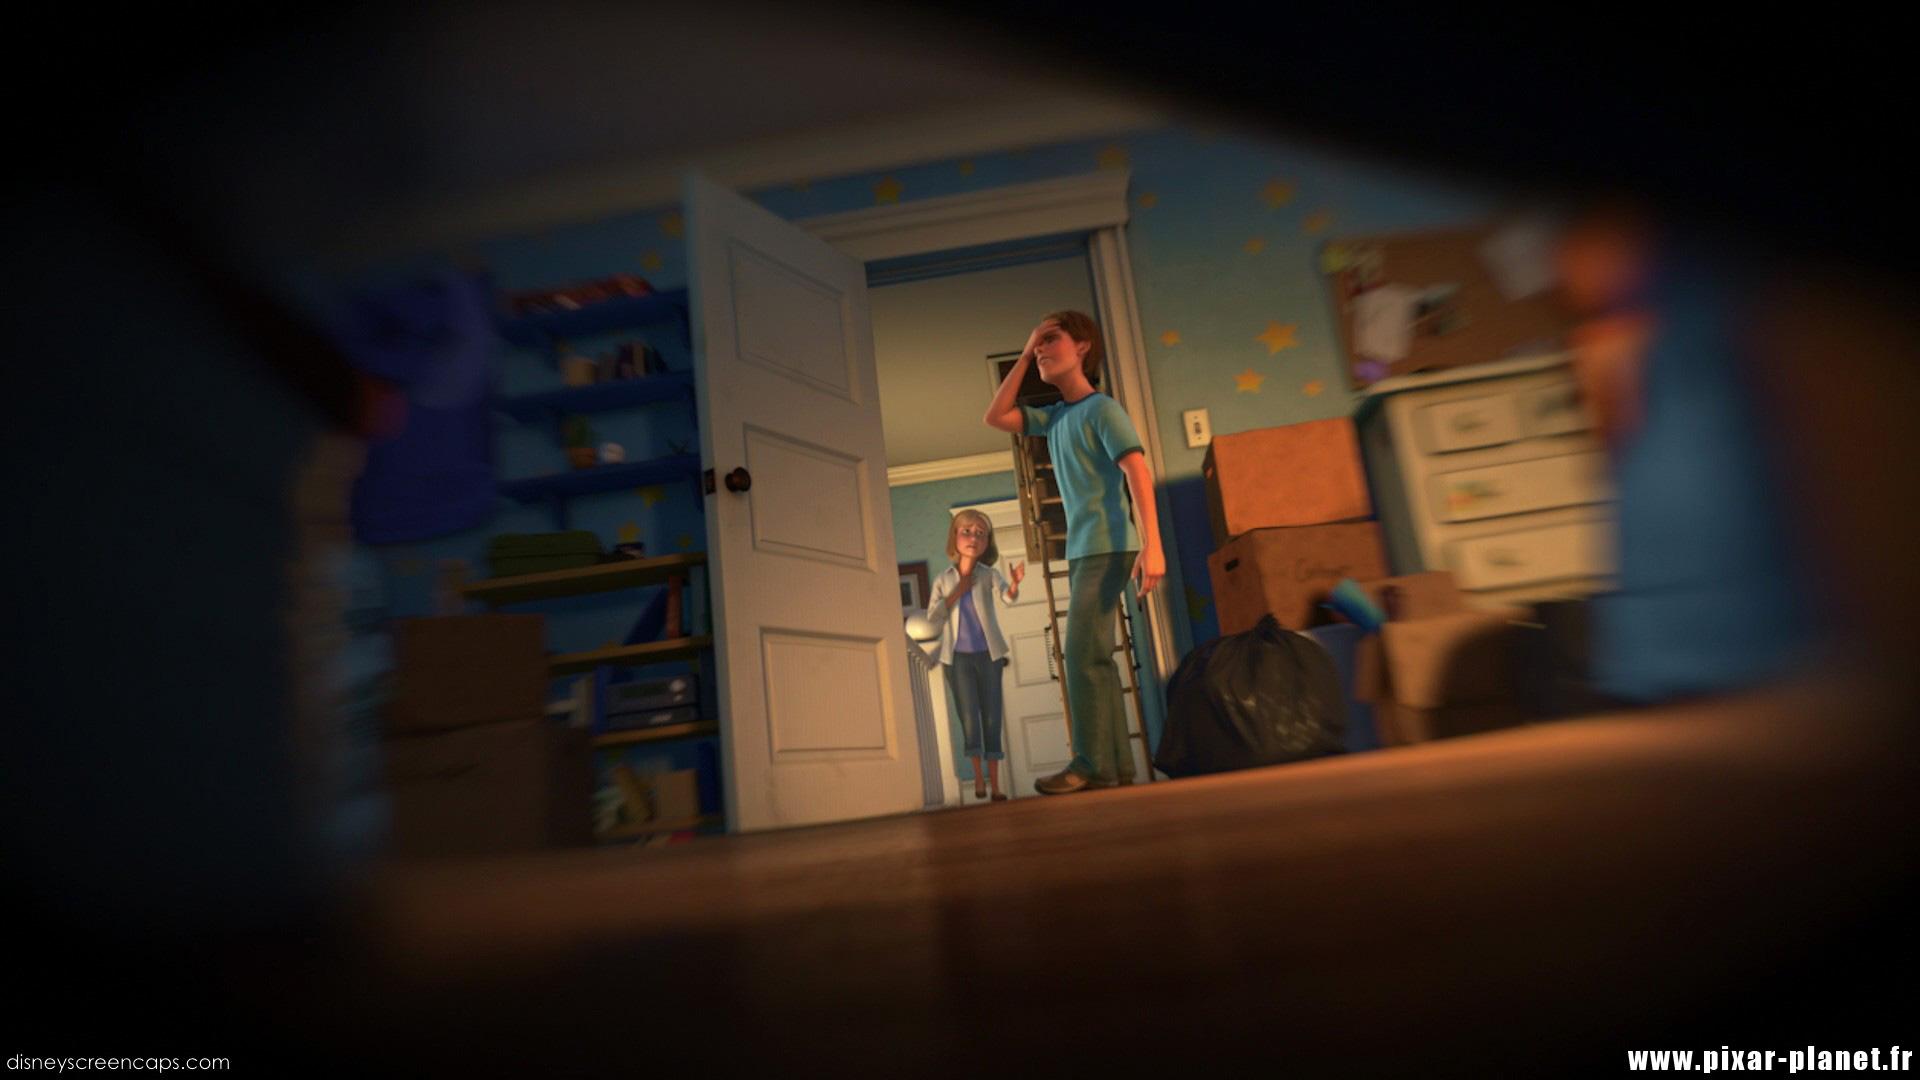 Pixar Planet Disney toy story 3